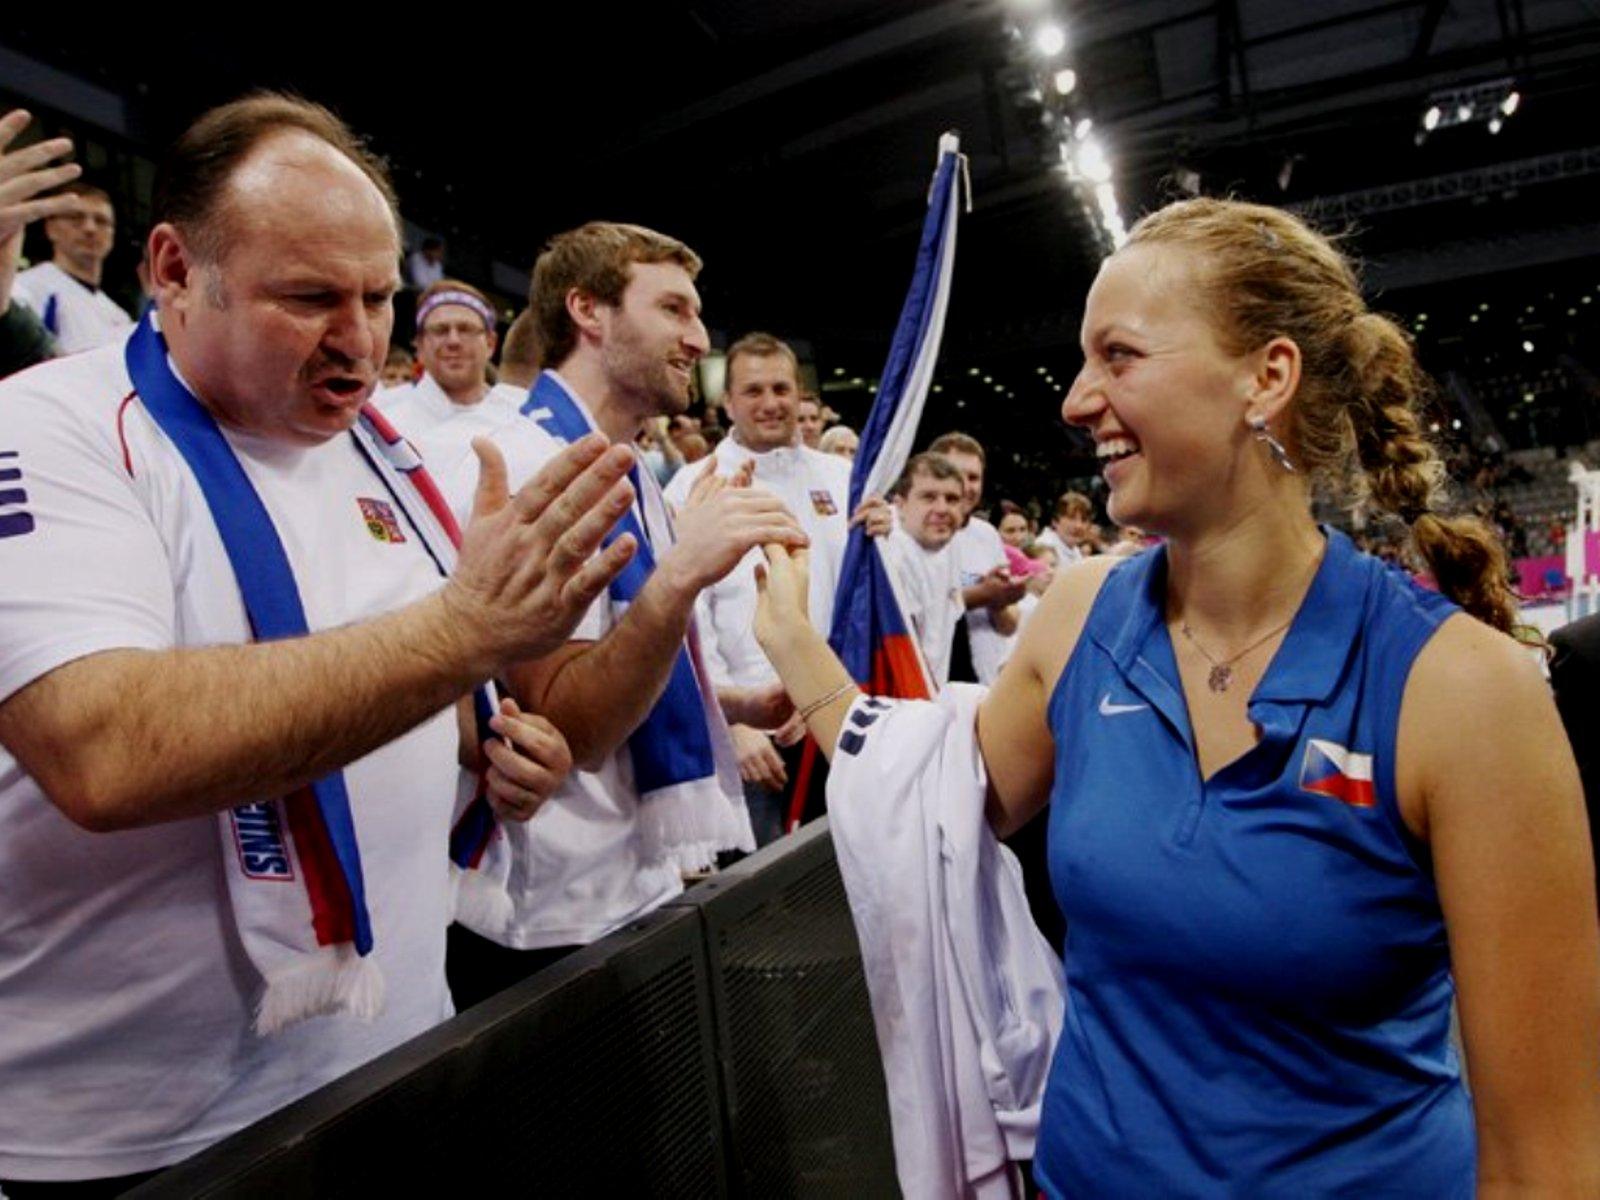 Tennis Petra Kvitova : Fan looks at her nipples !!